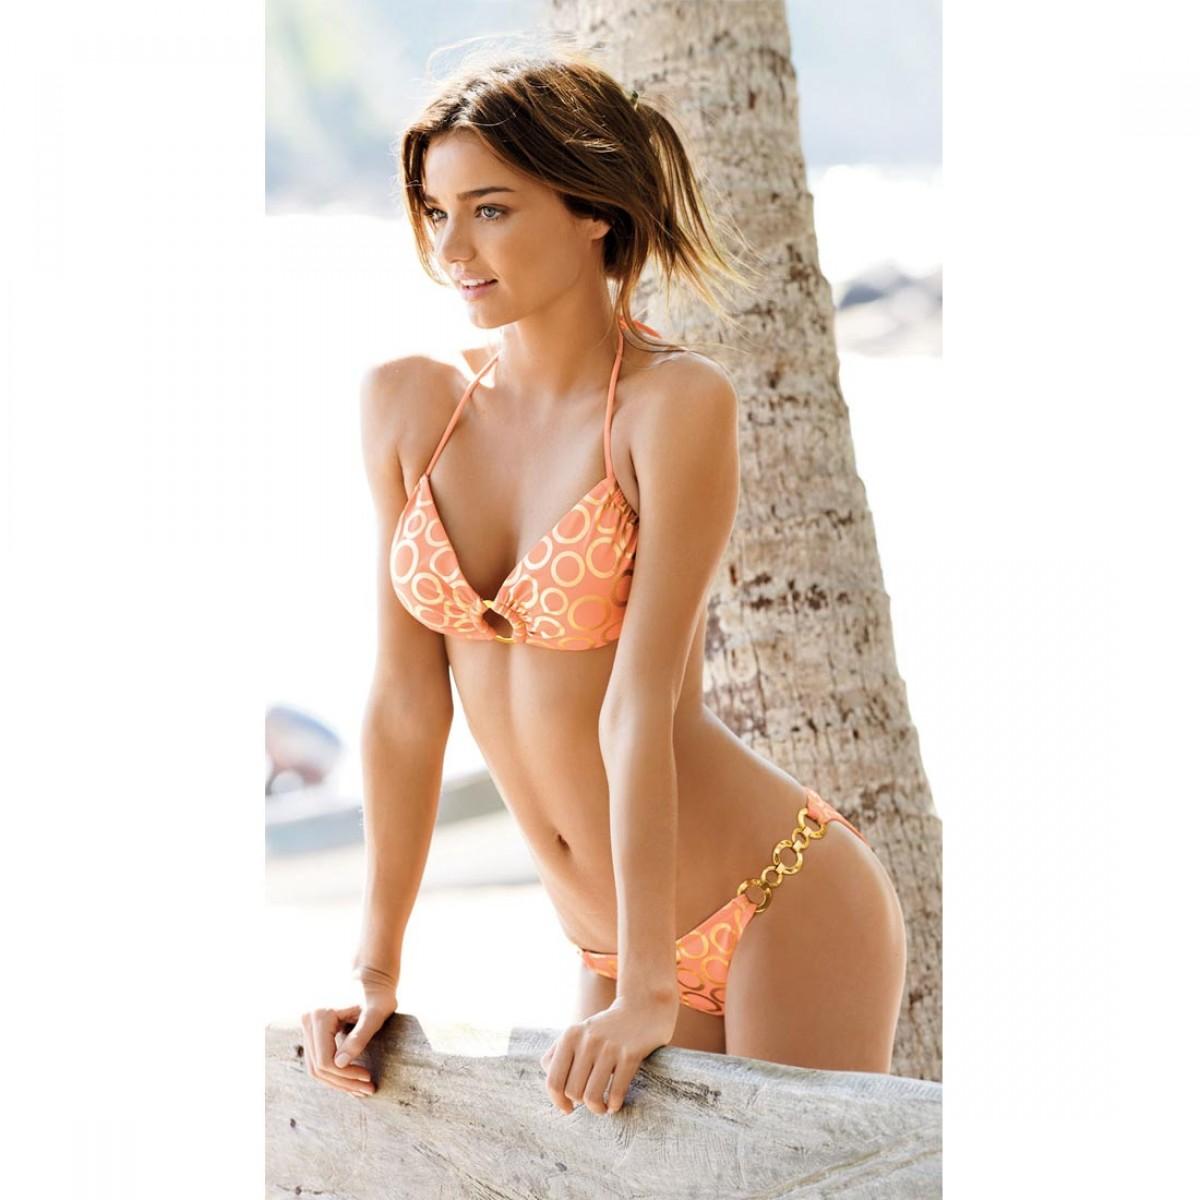 026327c5fda96 SecretShop24.com | Victoria's Secret Sexy Bikini Swimsuit Online ...